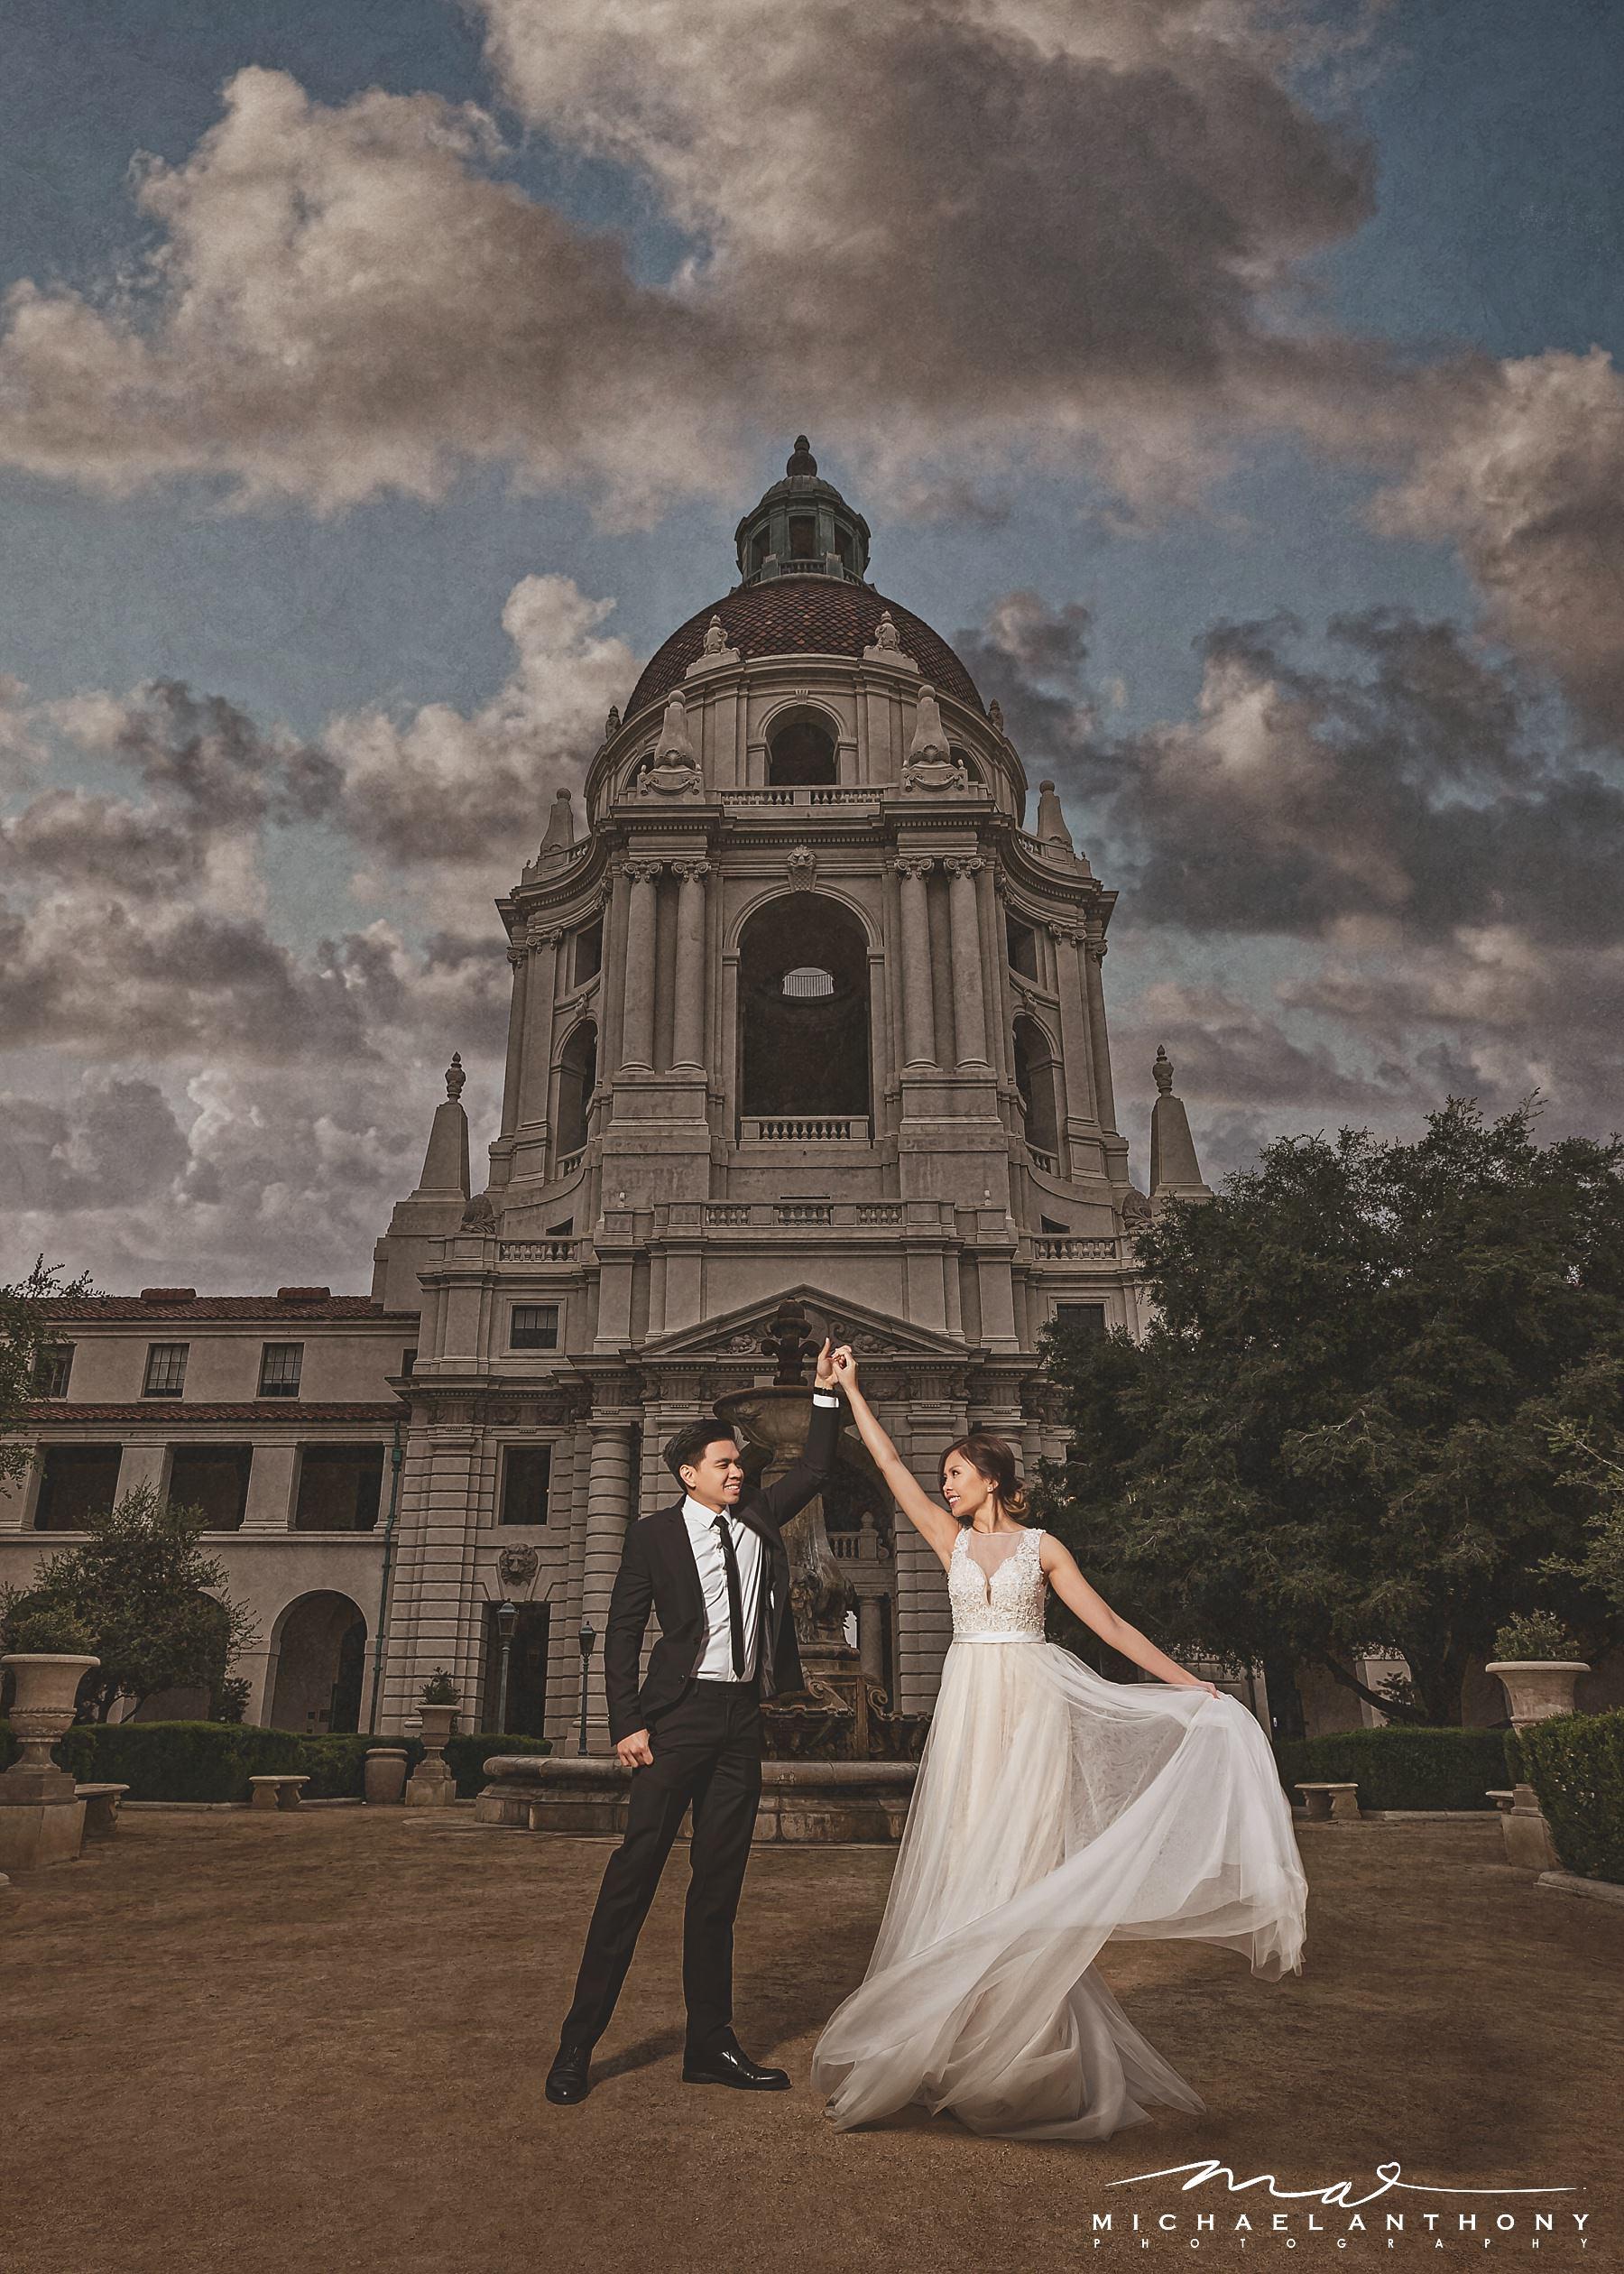 Pasadena City Hall Engagement Session | Jonathan & Lanphi